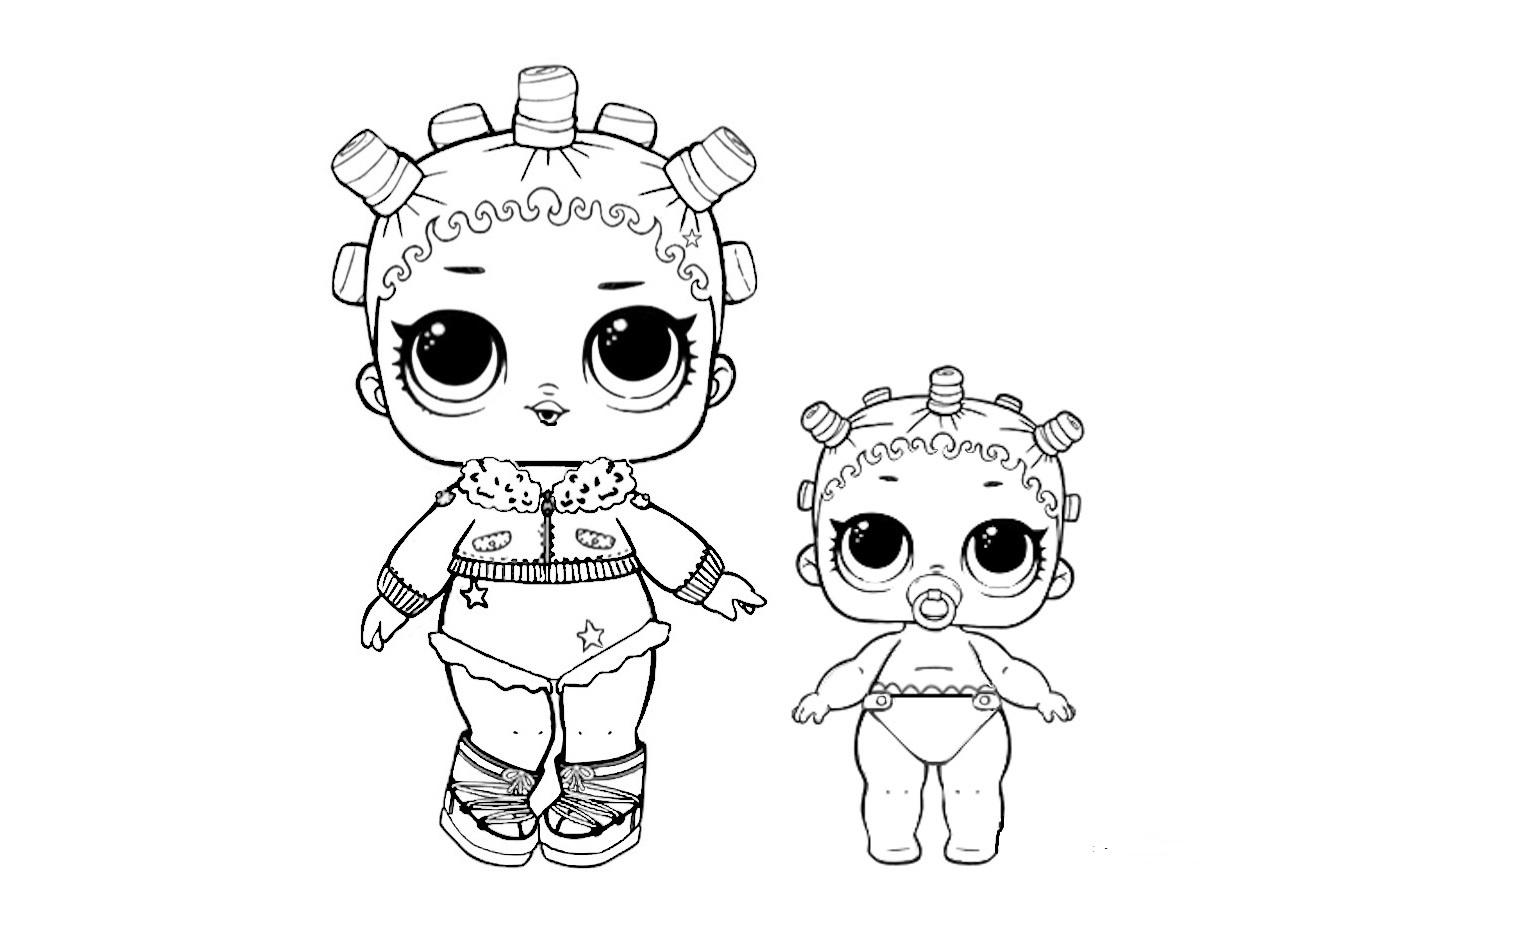 Раскраска куколки лол малышки на vipraskraski.ru